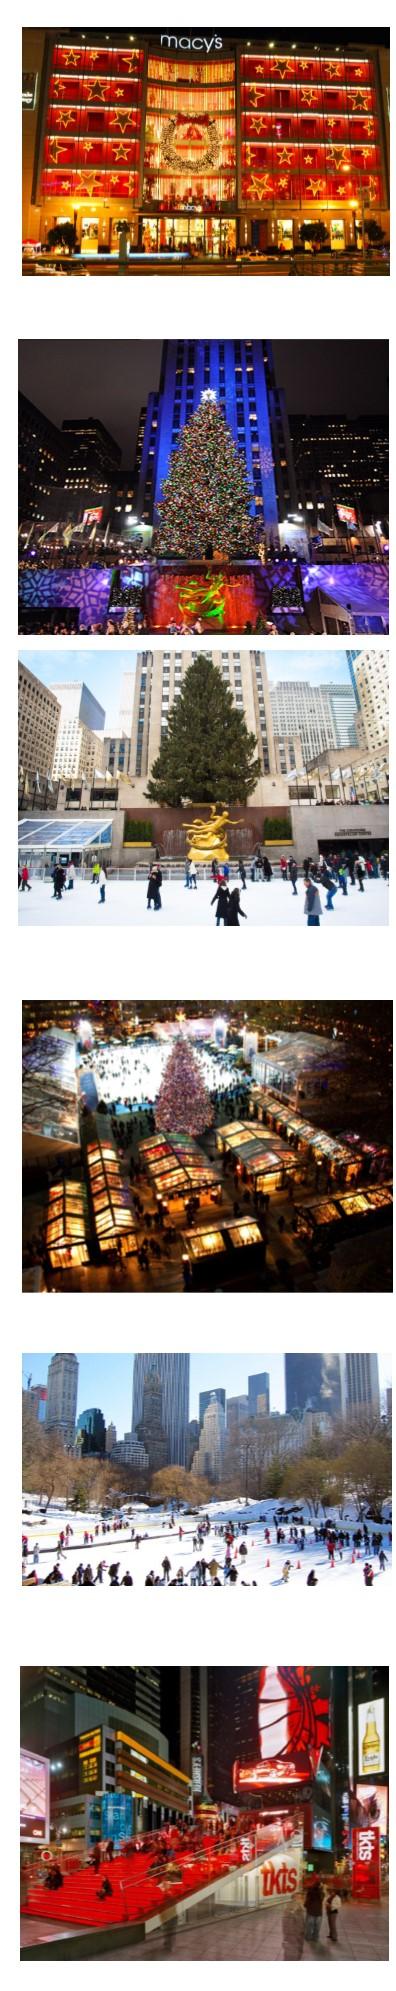 ny-christmas-blog